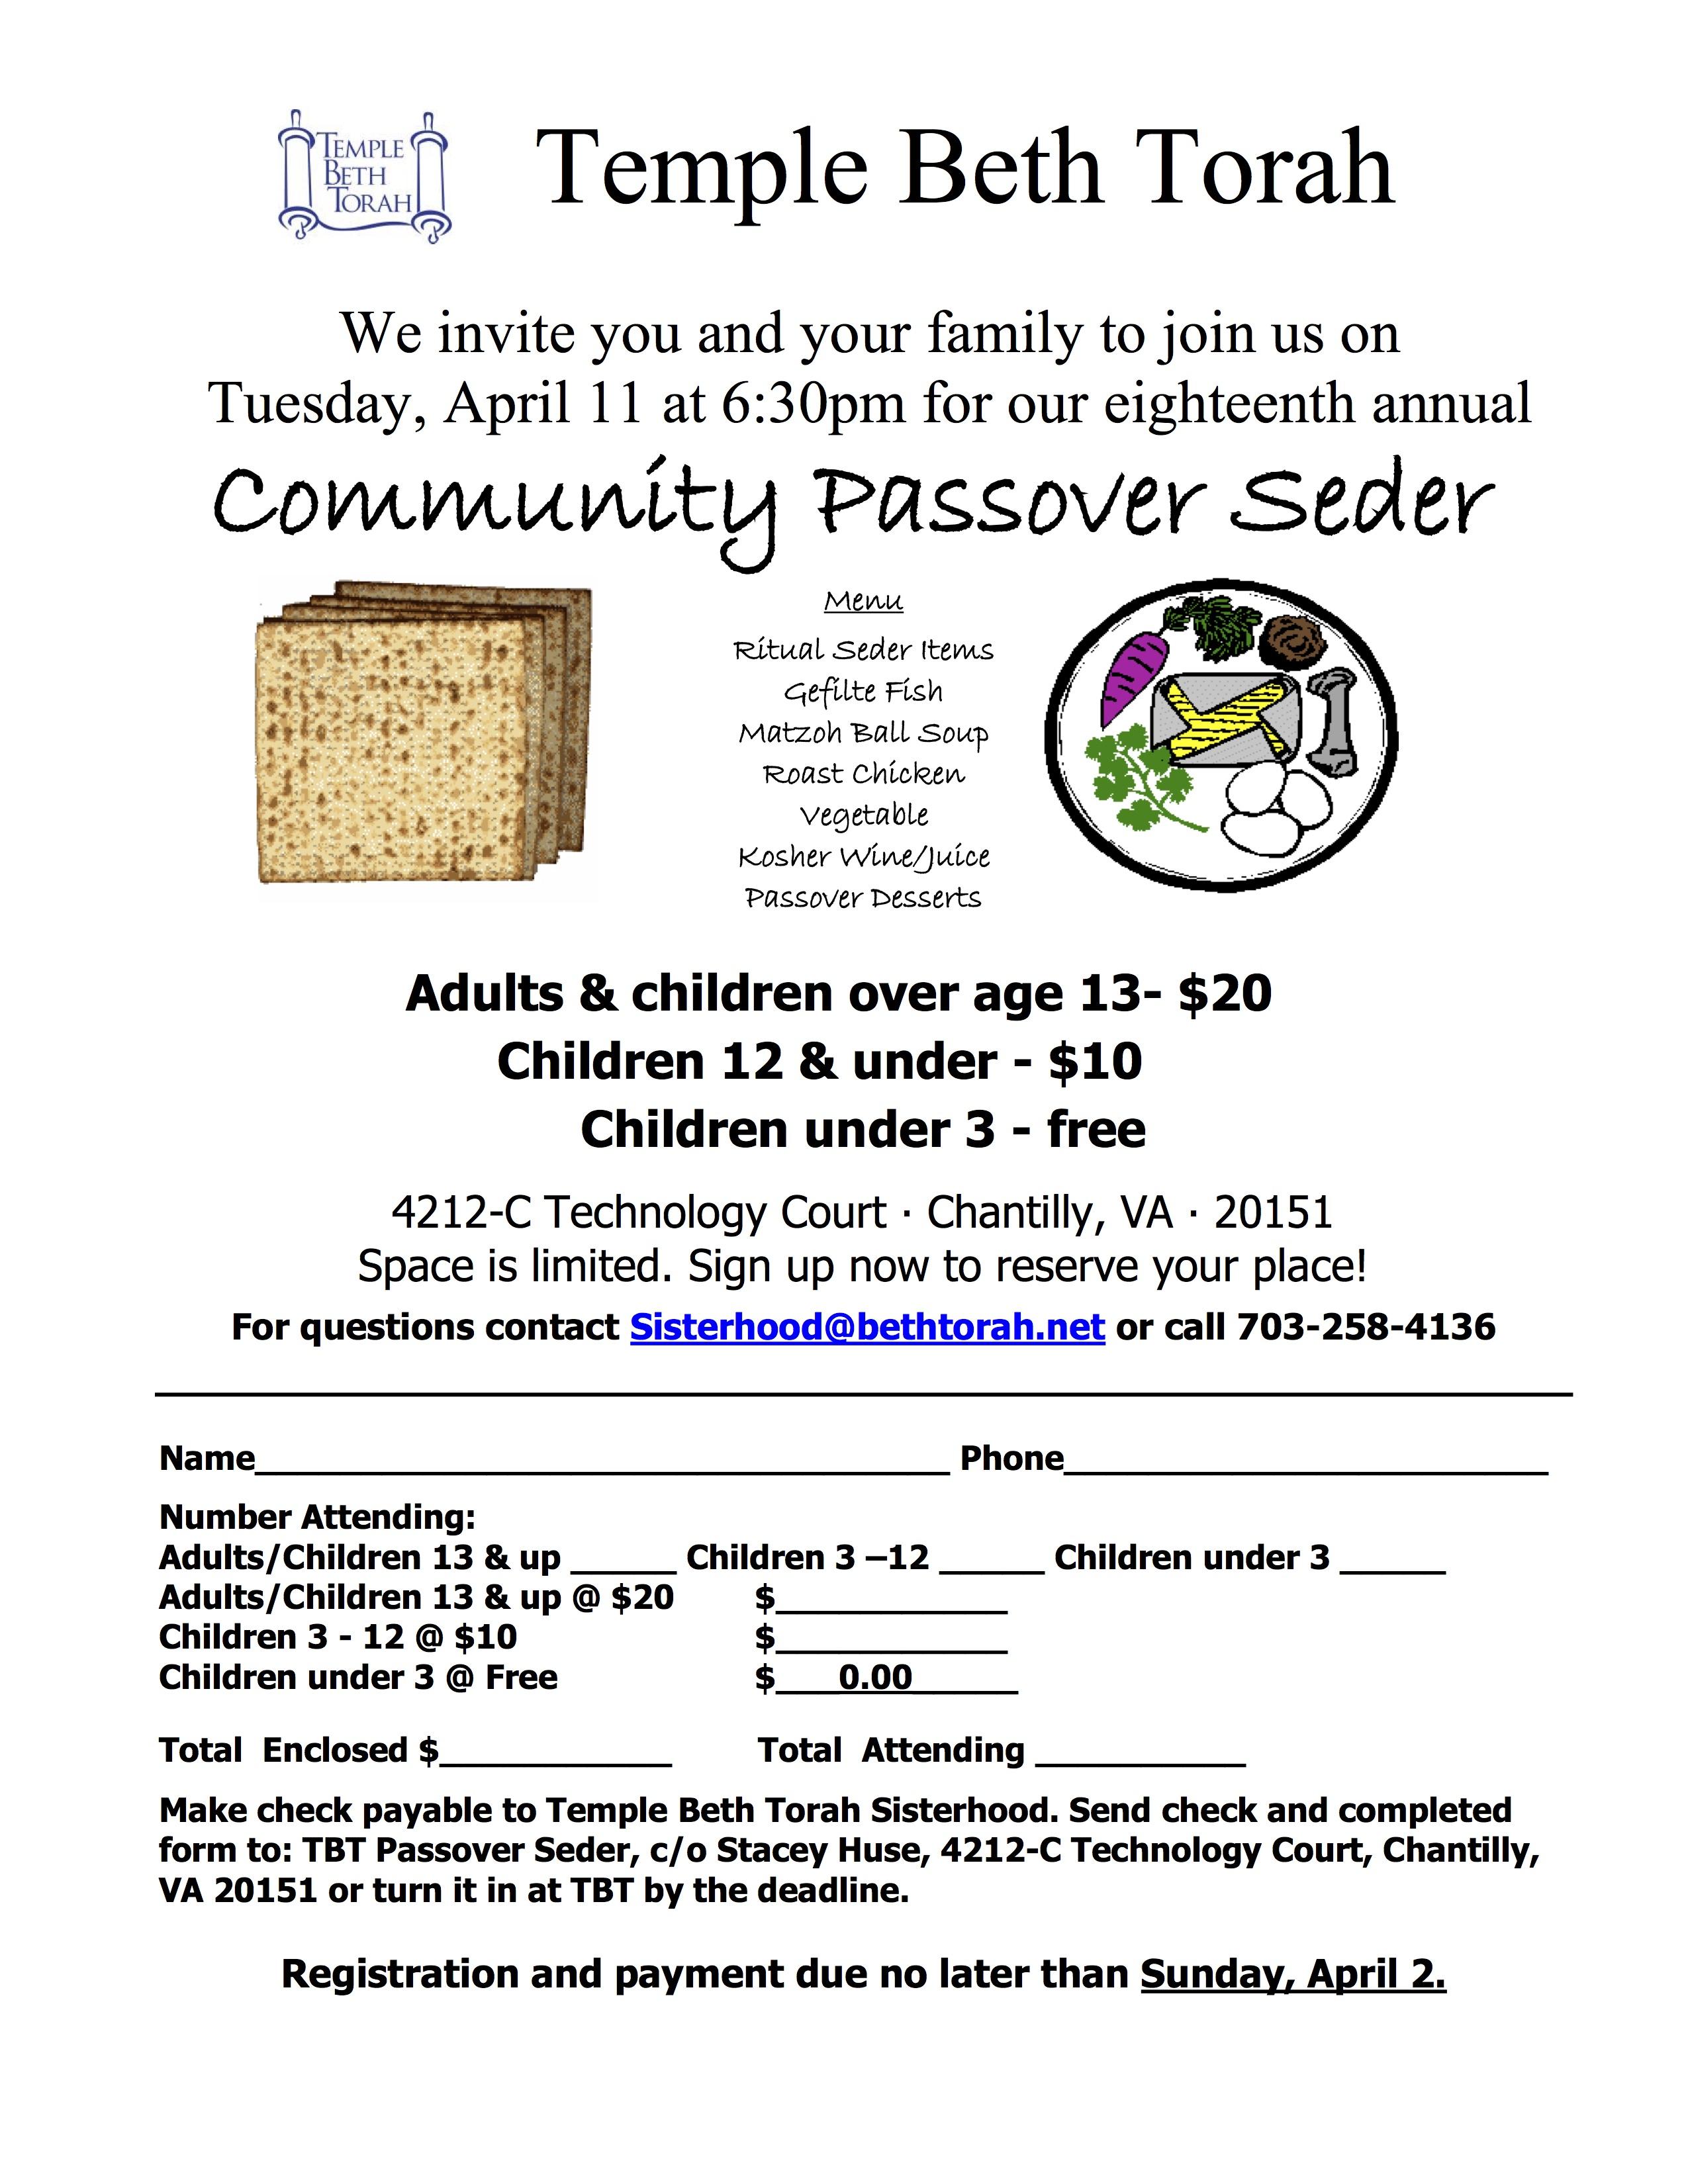 Passover Seder Flyer 2017 external hybrid